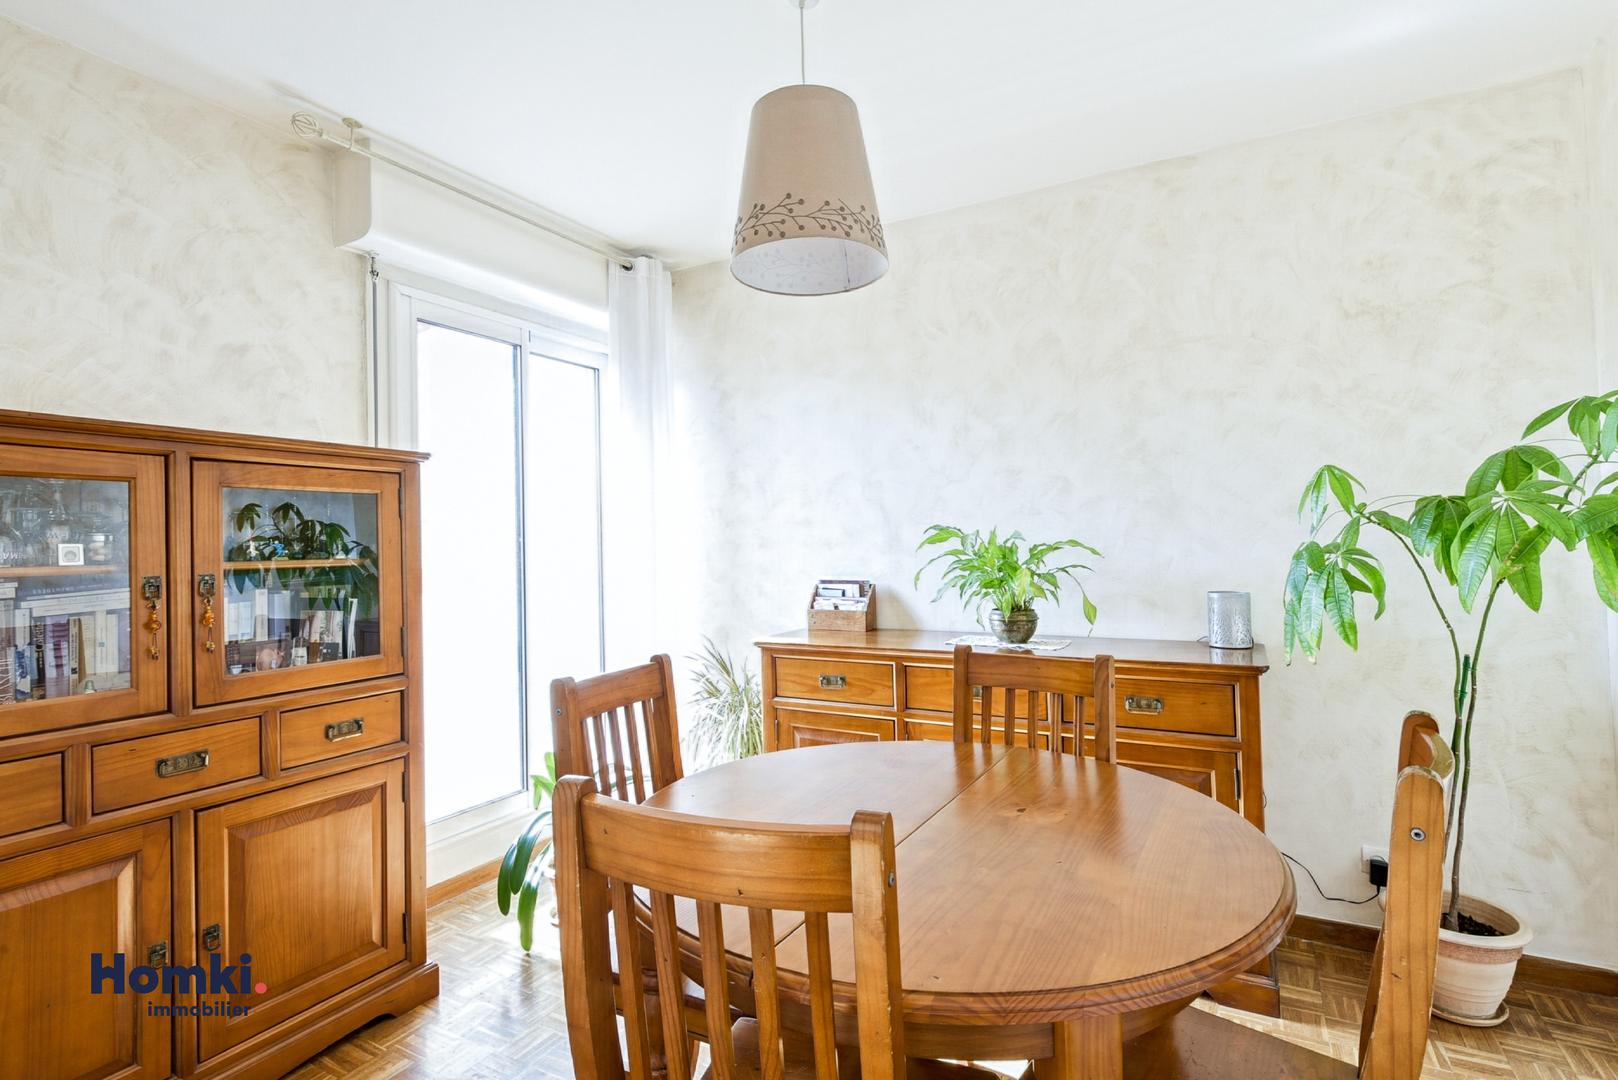 Vente appartement MArseille 13010 T5_4